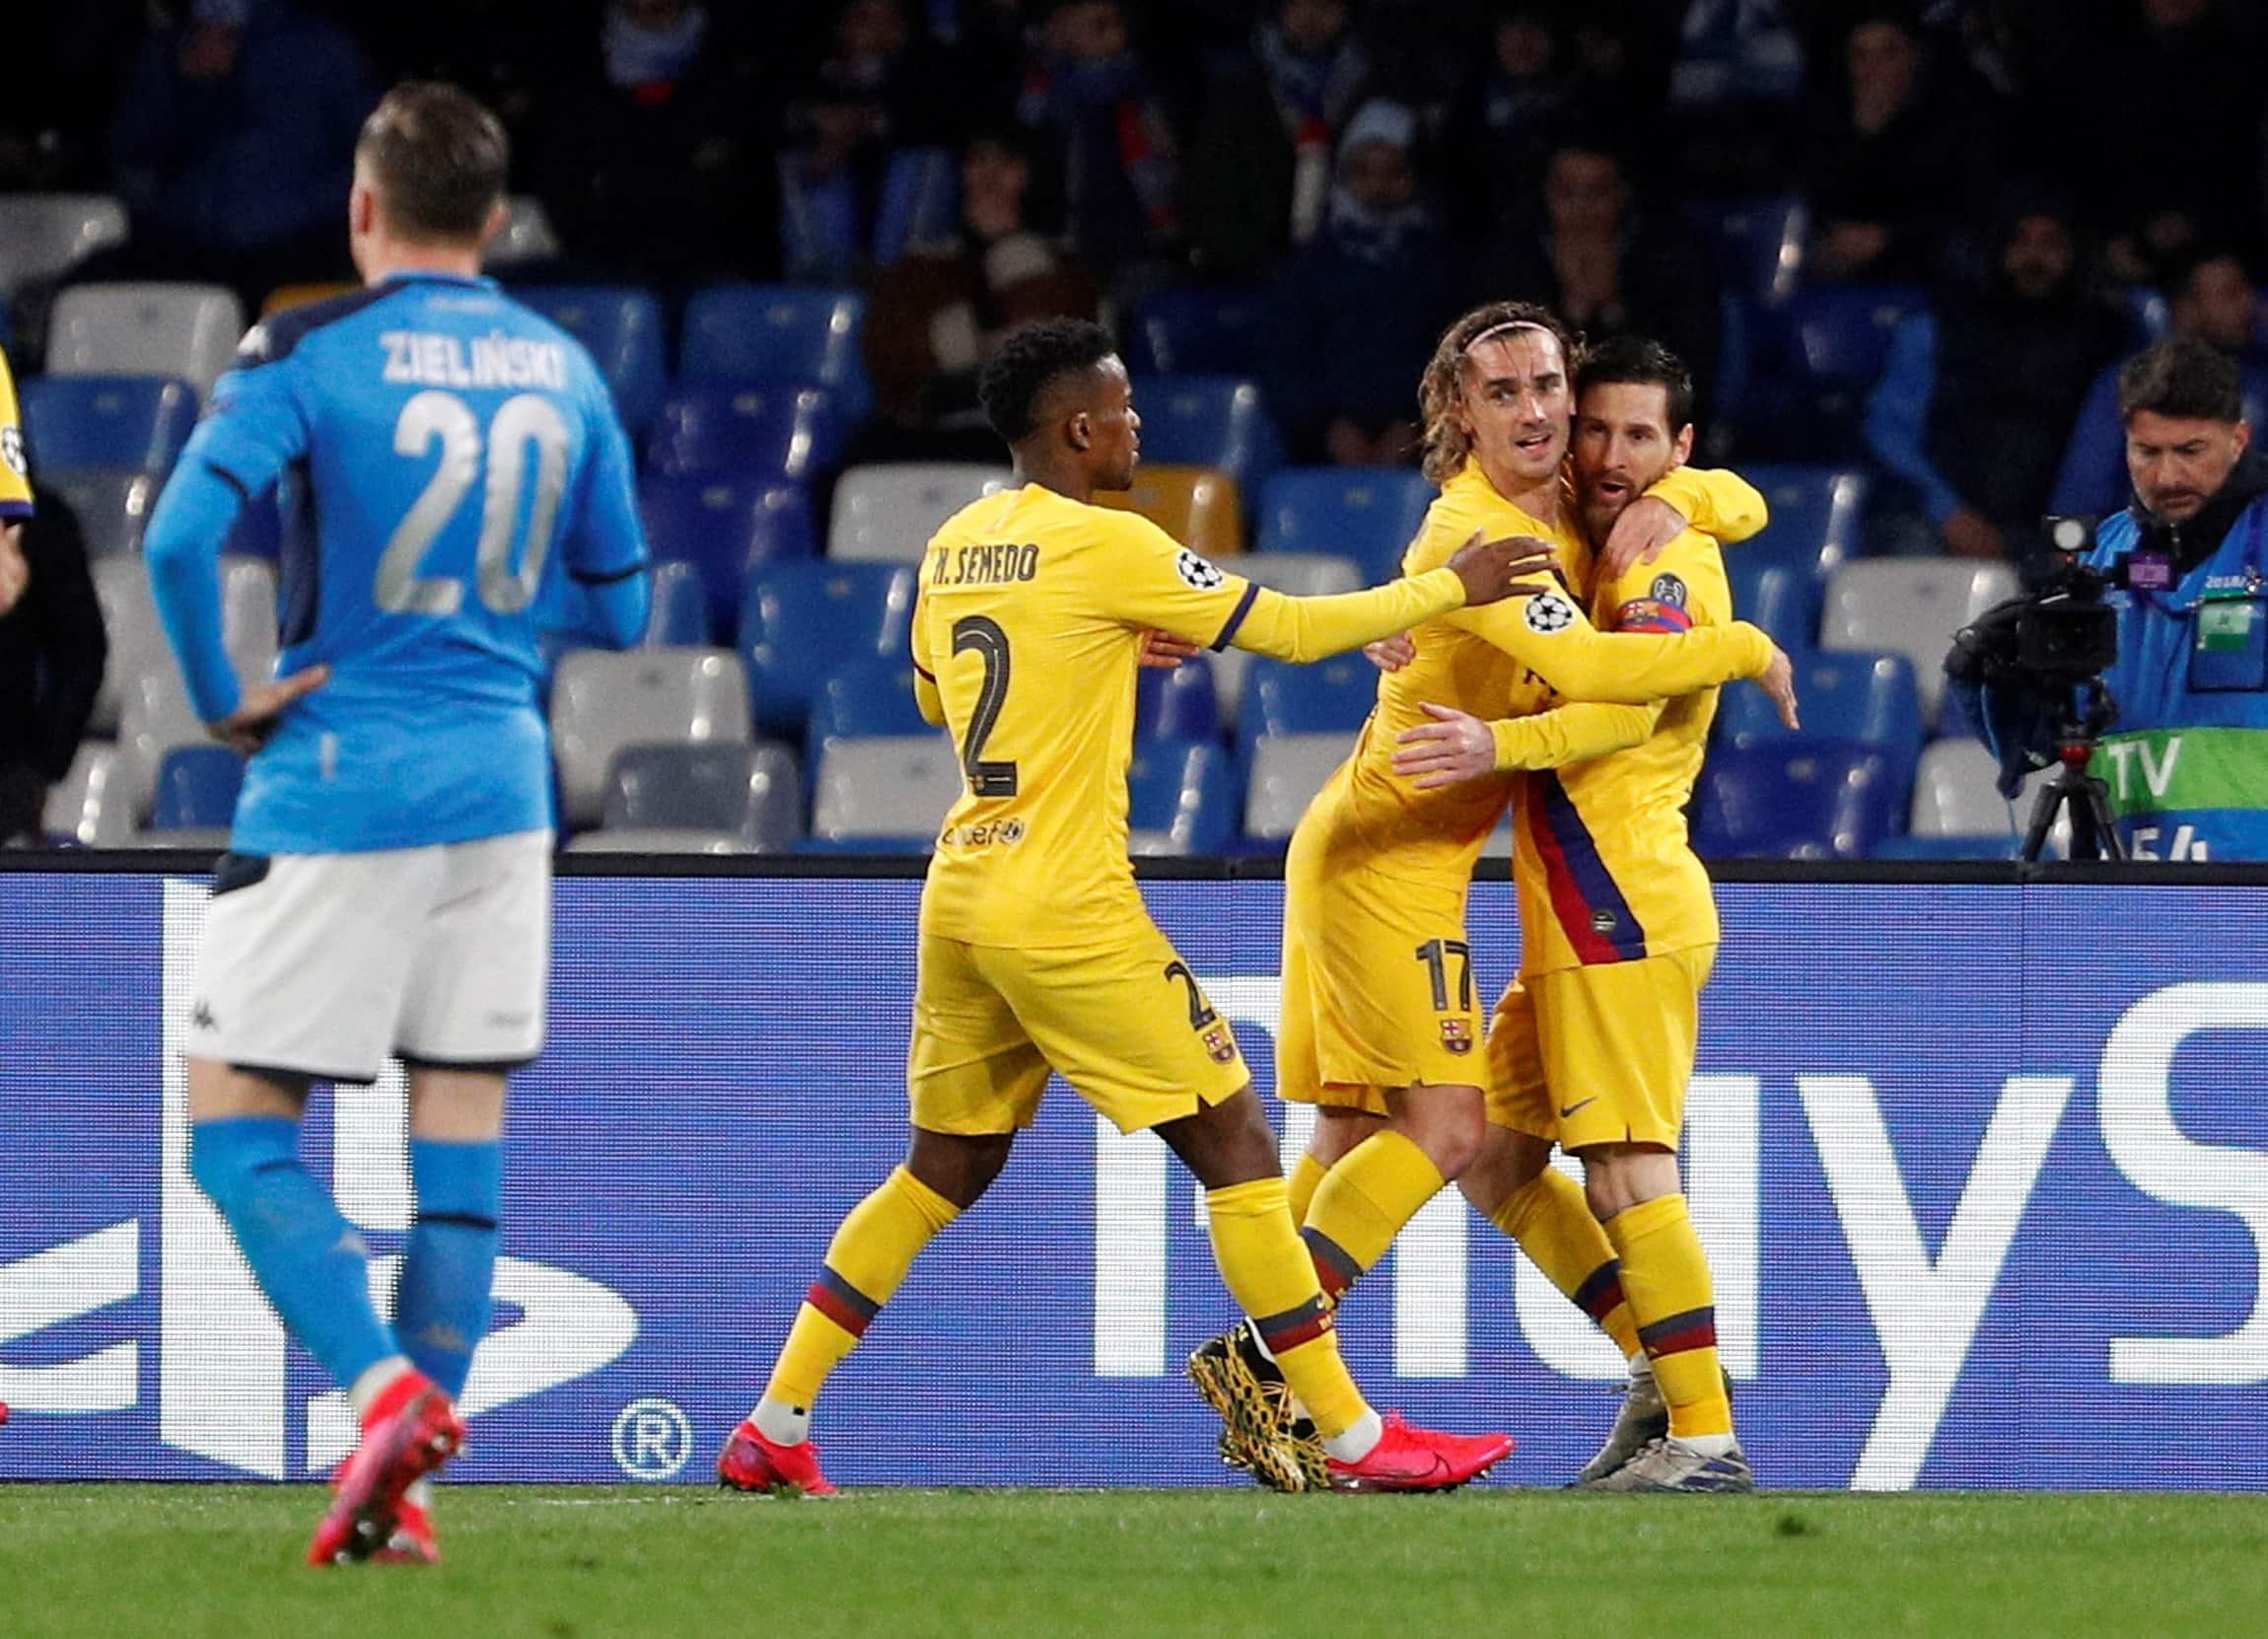 Barcelona draw 1-1 Napoli in Champions League last-16 tie, Antoine Griezmann and Dries Mertens scorers